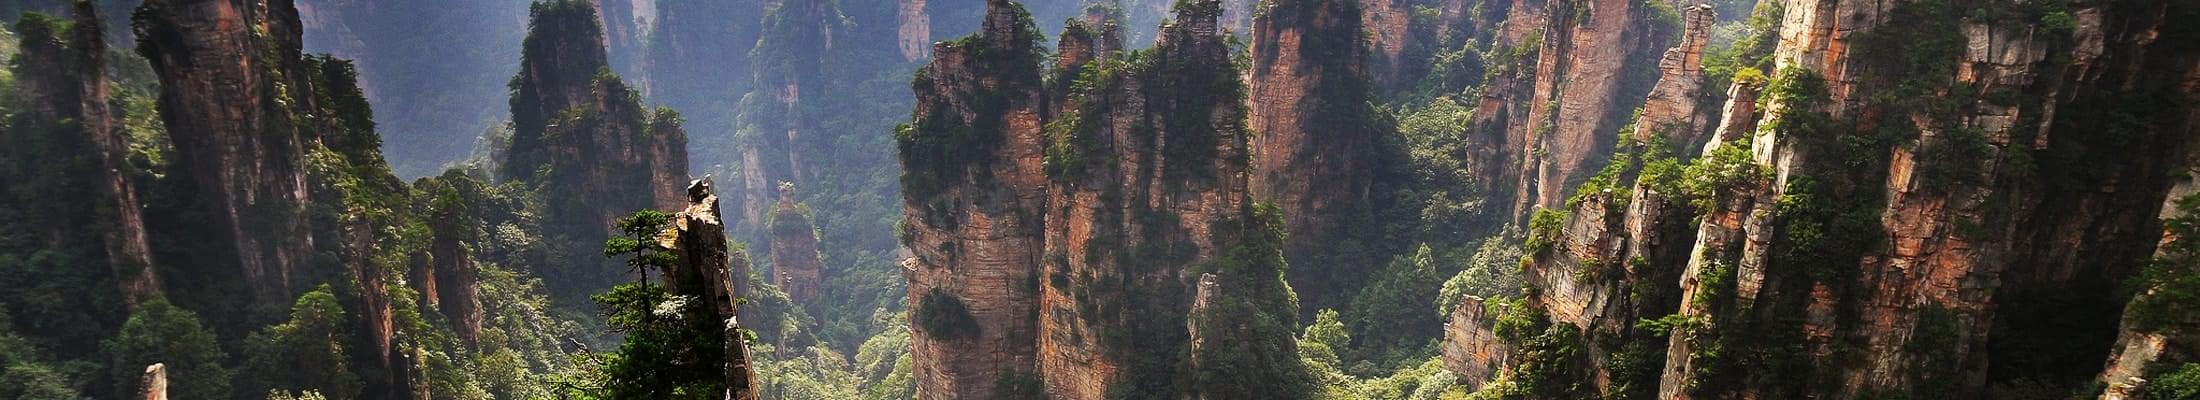 Горы Аватара и остров Хайнань <br> Пекин — Лоян — Сиань — Чжанцзяцзе — Шанхай — Санья — Пекин (Гонконг)